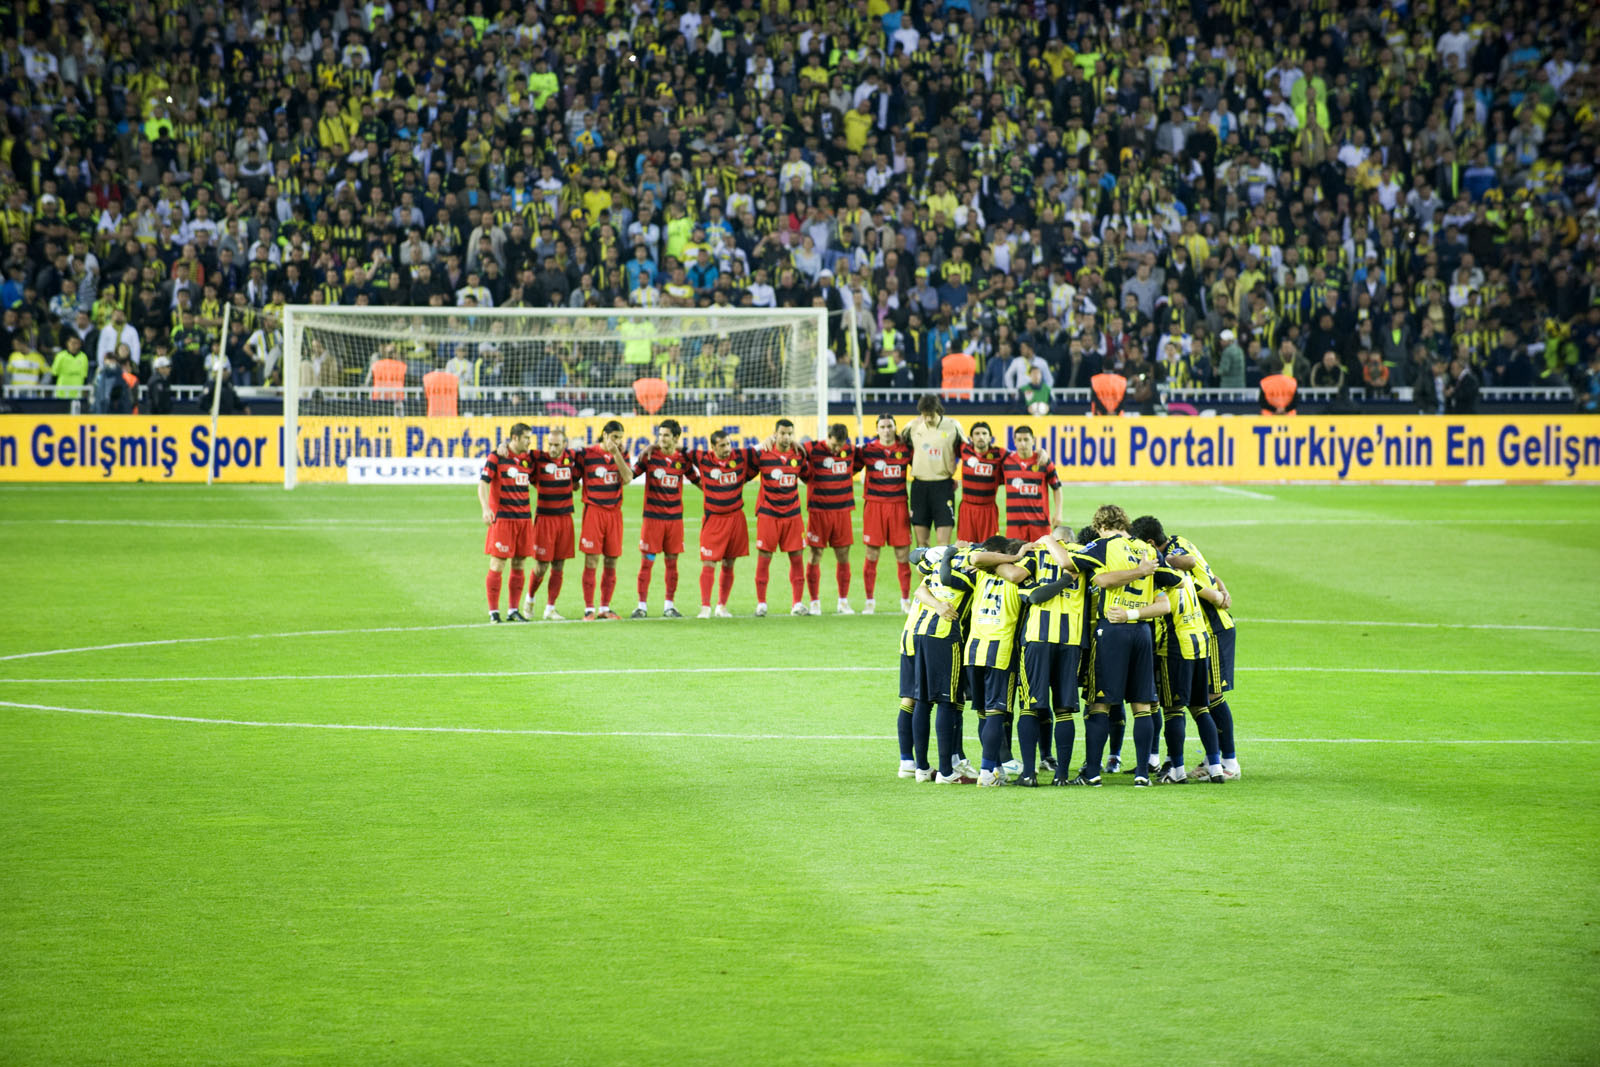 fenerbahce eskisehir Eskişehirspor Fenerbahçe Maçı Canlı Radyo dinle